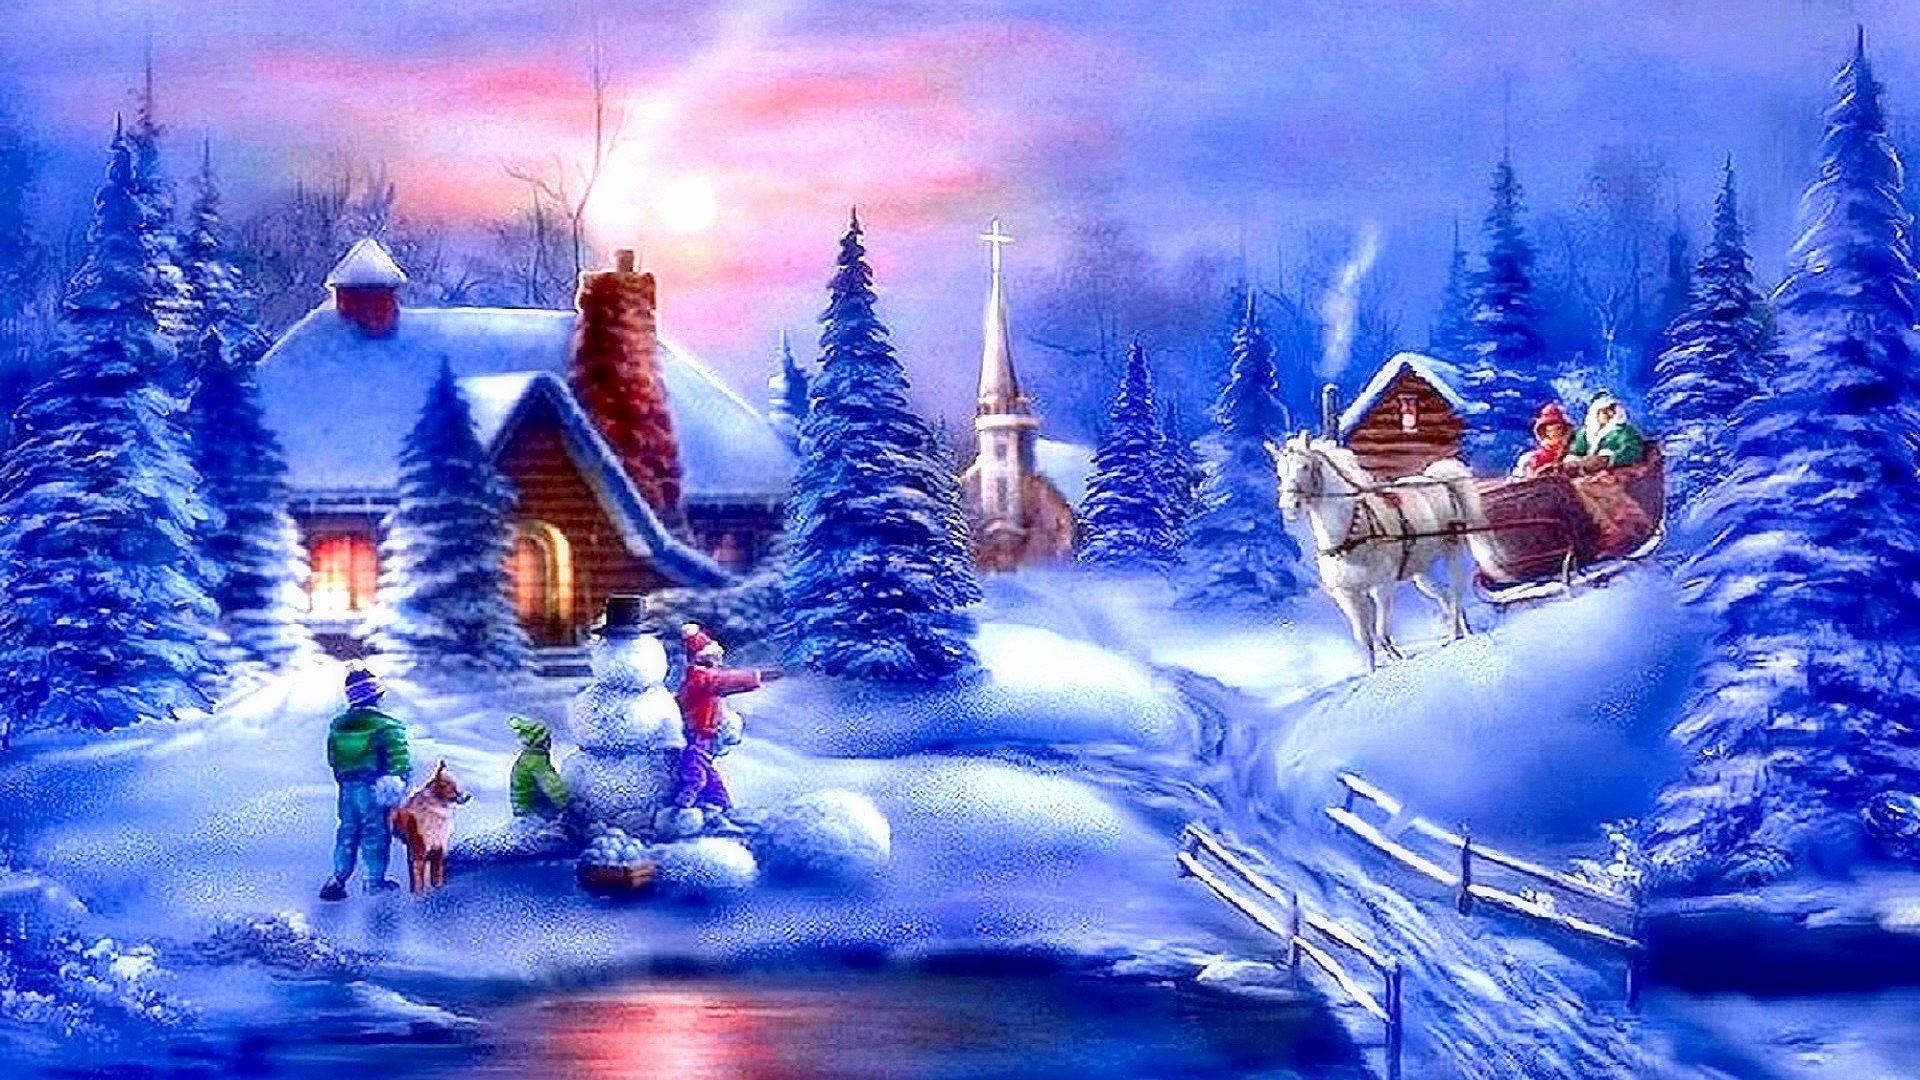 snowy scene wallpaper 54 pictures